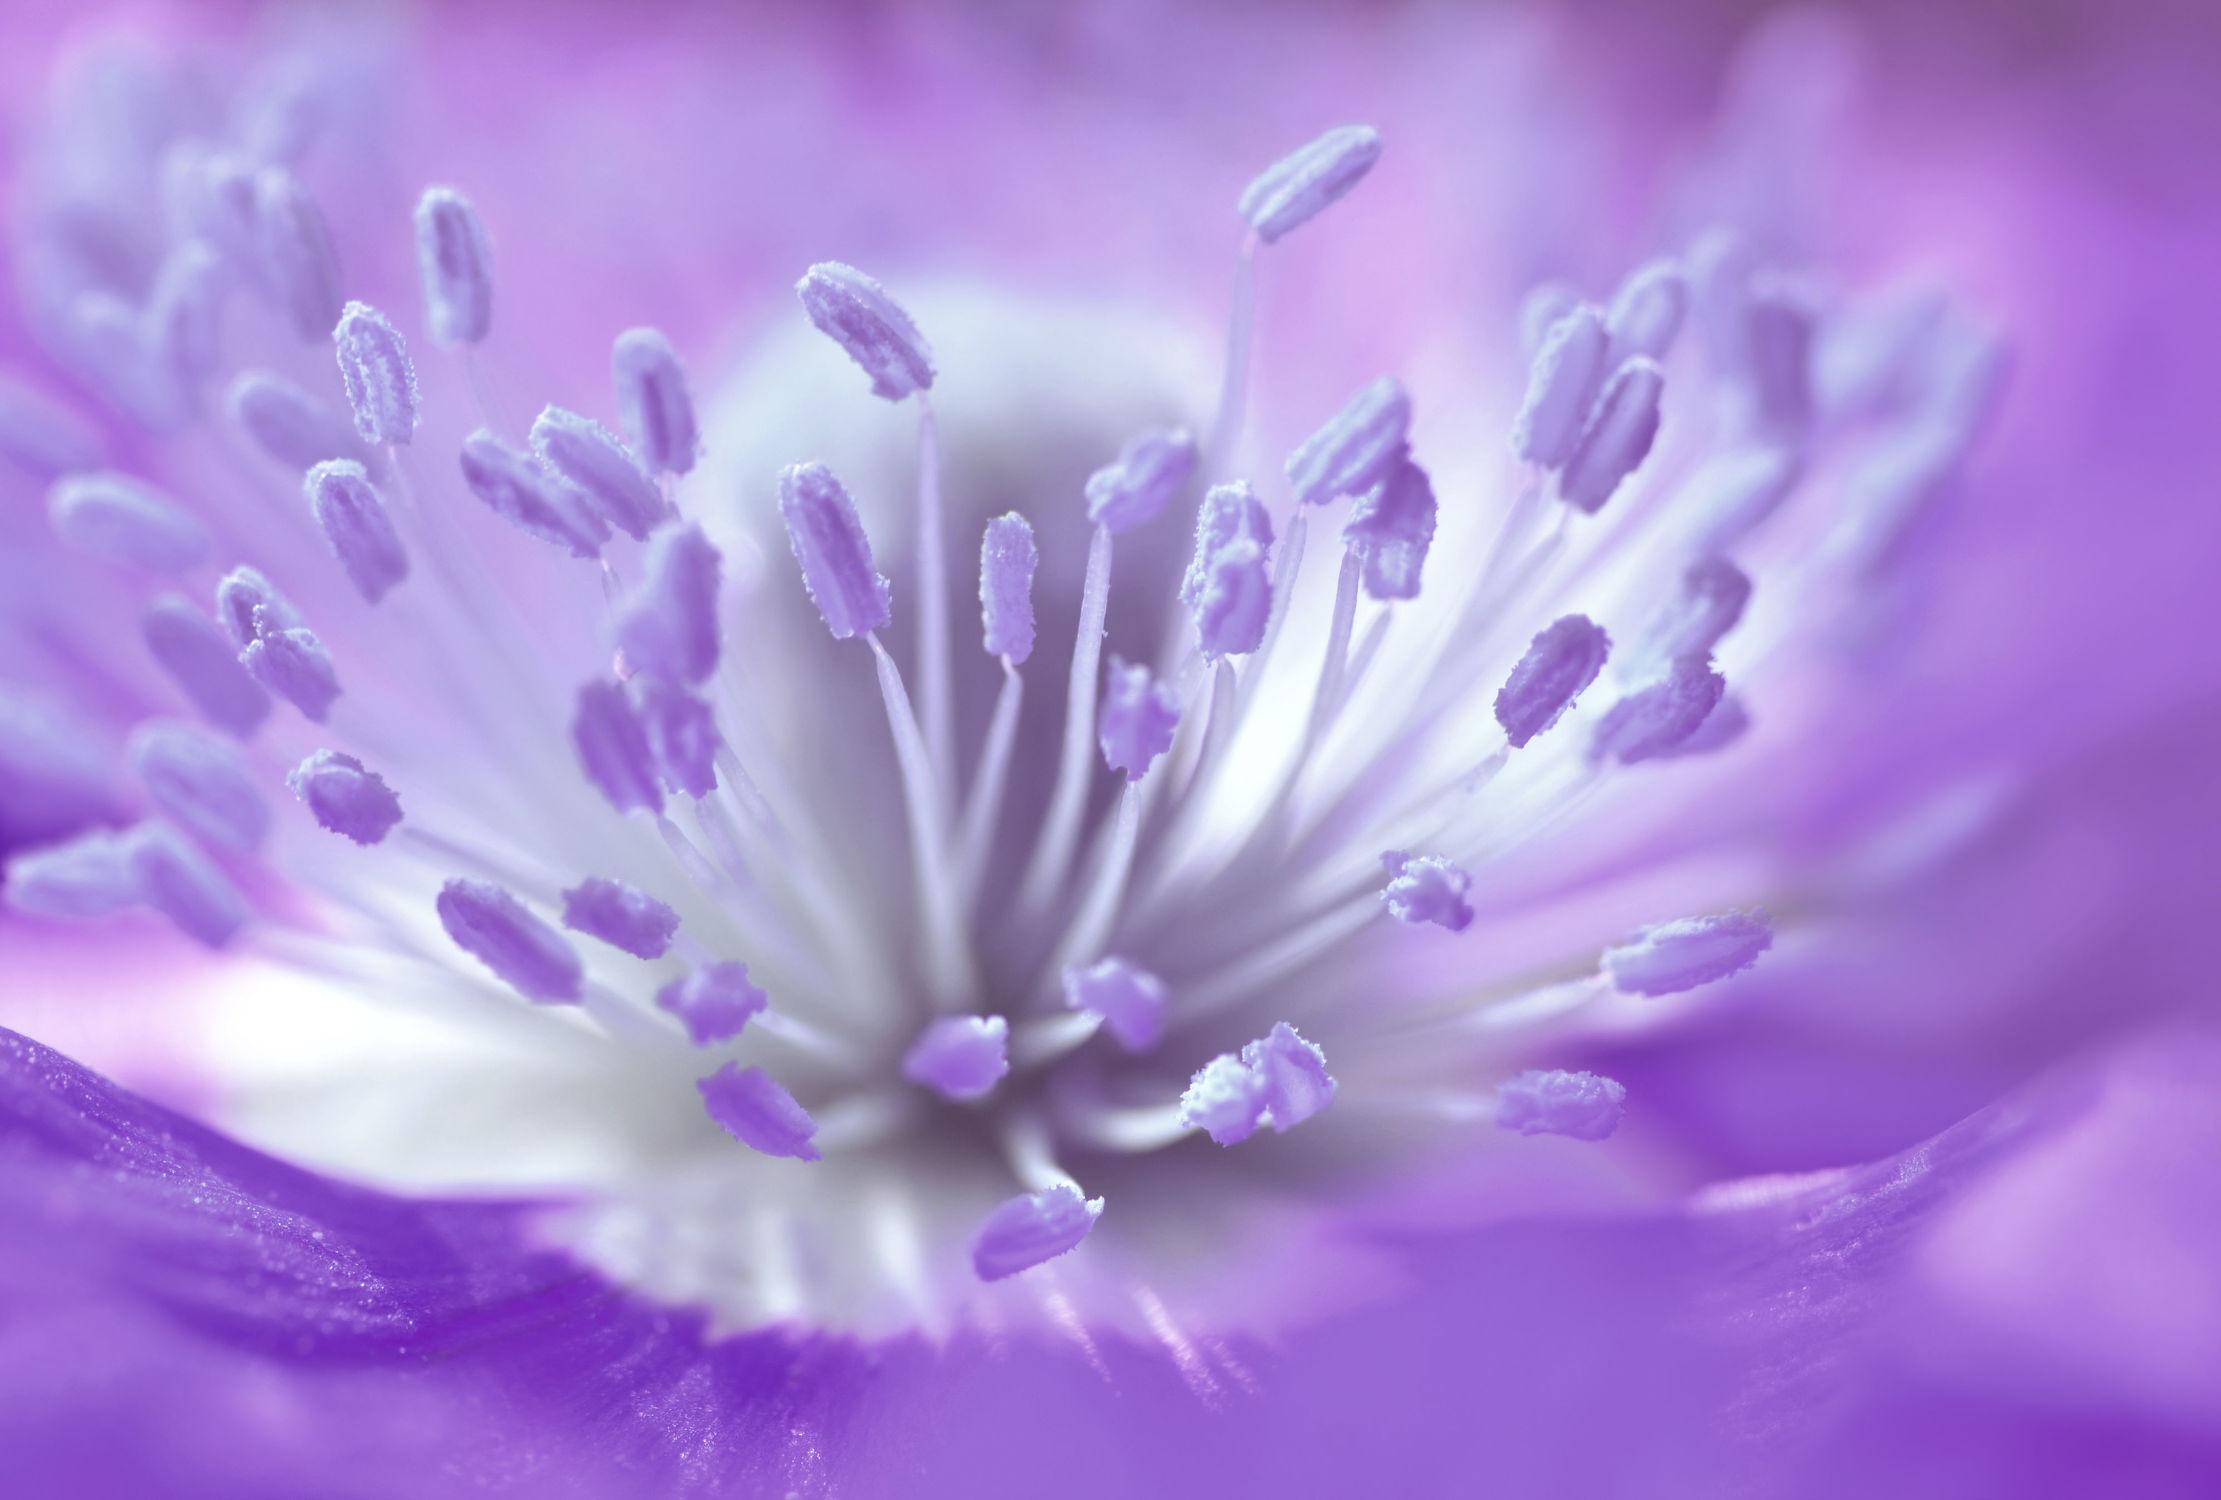 Bild mit Pflanzen, Blumen, Lila, Violett, Frühling, Mohn, Makroaufnahme, Blume, Pflanze, Mohnblume, Klatschmohn, Makro, Mohnblüte, Blumen und Pflanzen, Flora, Mohnblumen, blüte, detail, dekorativ